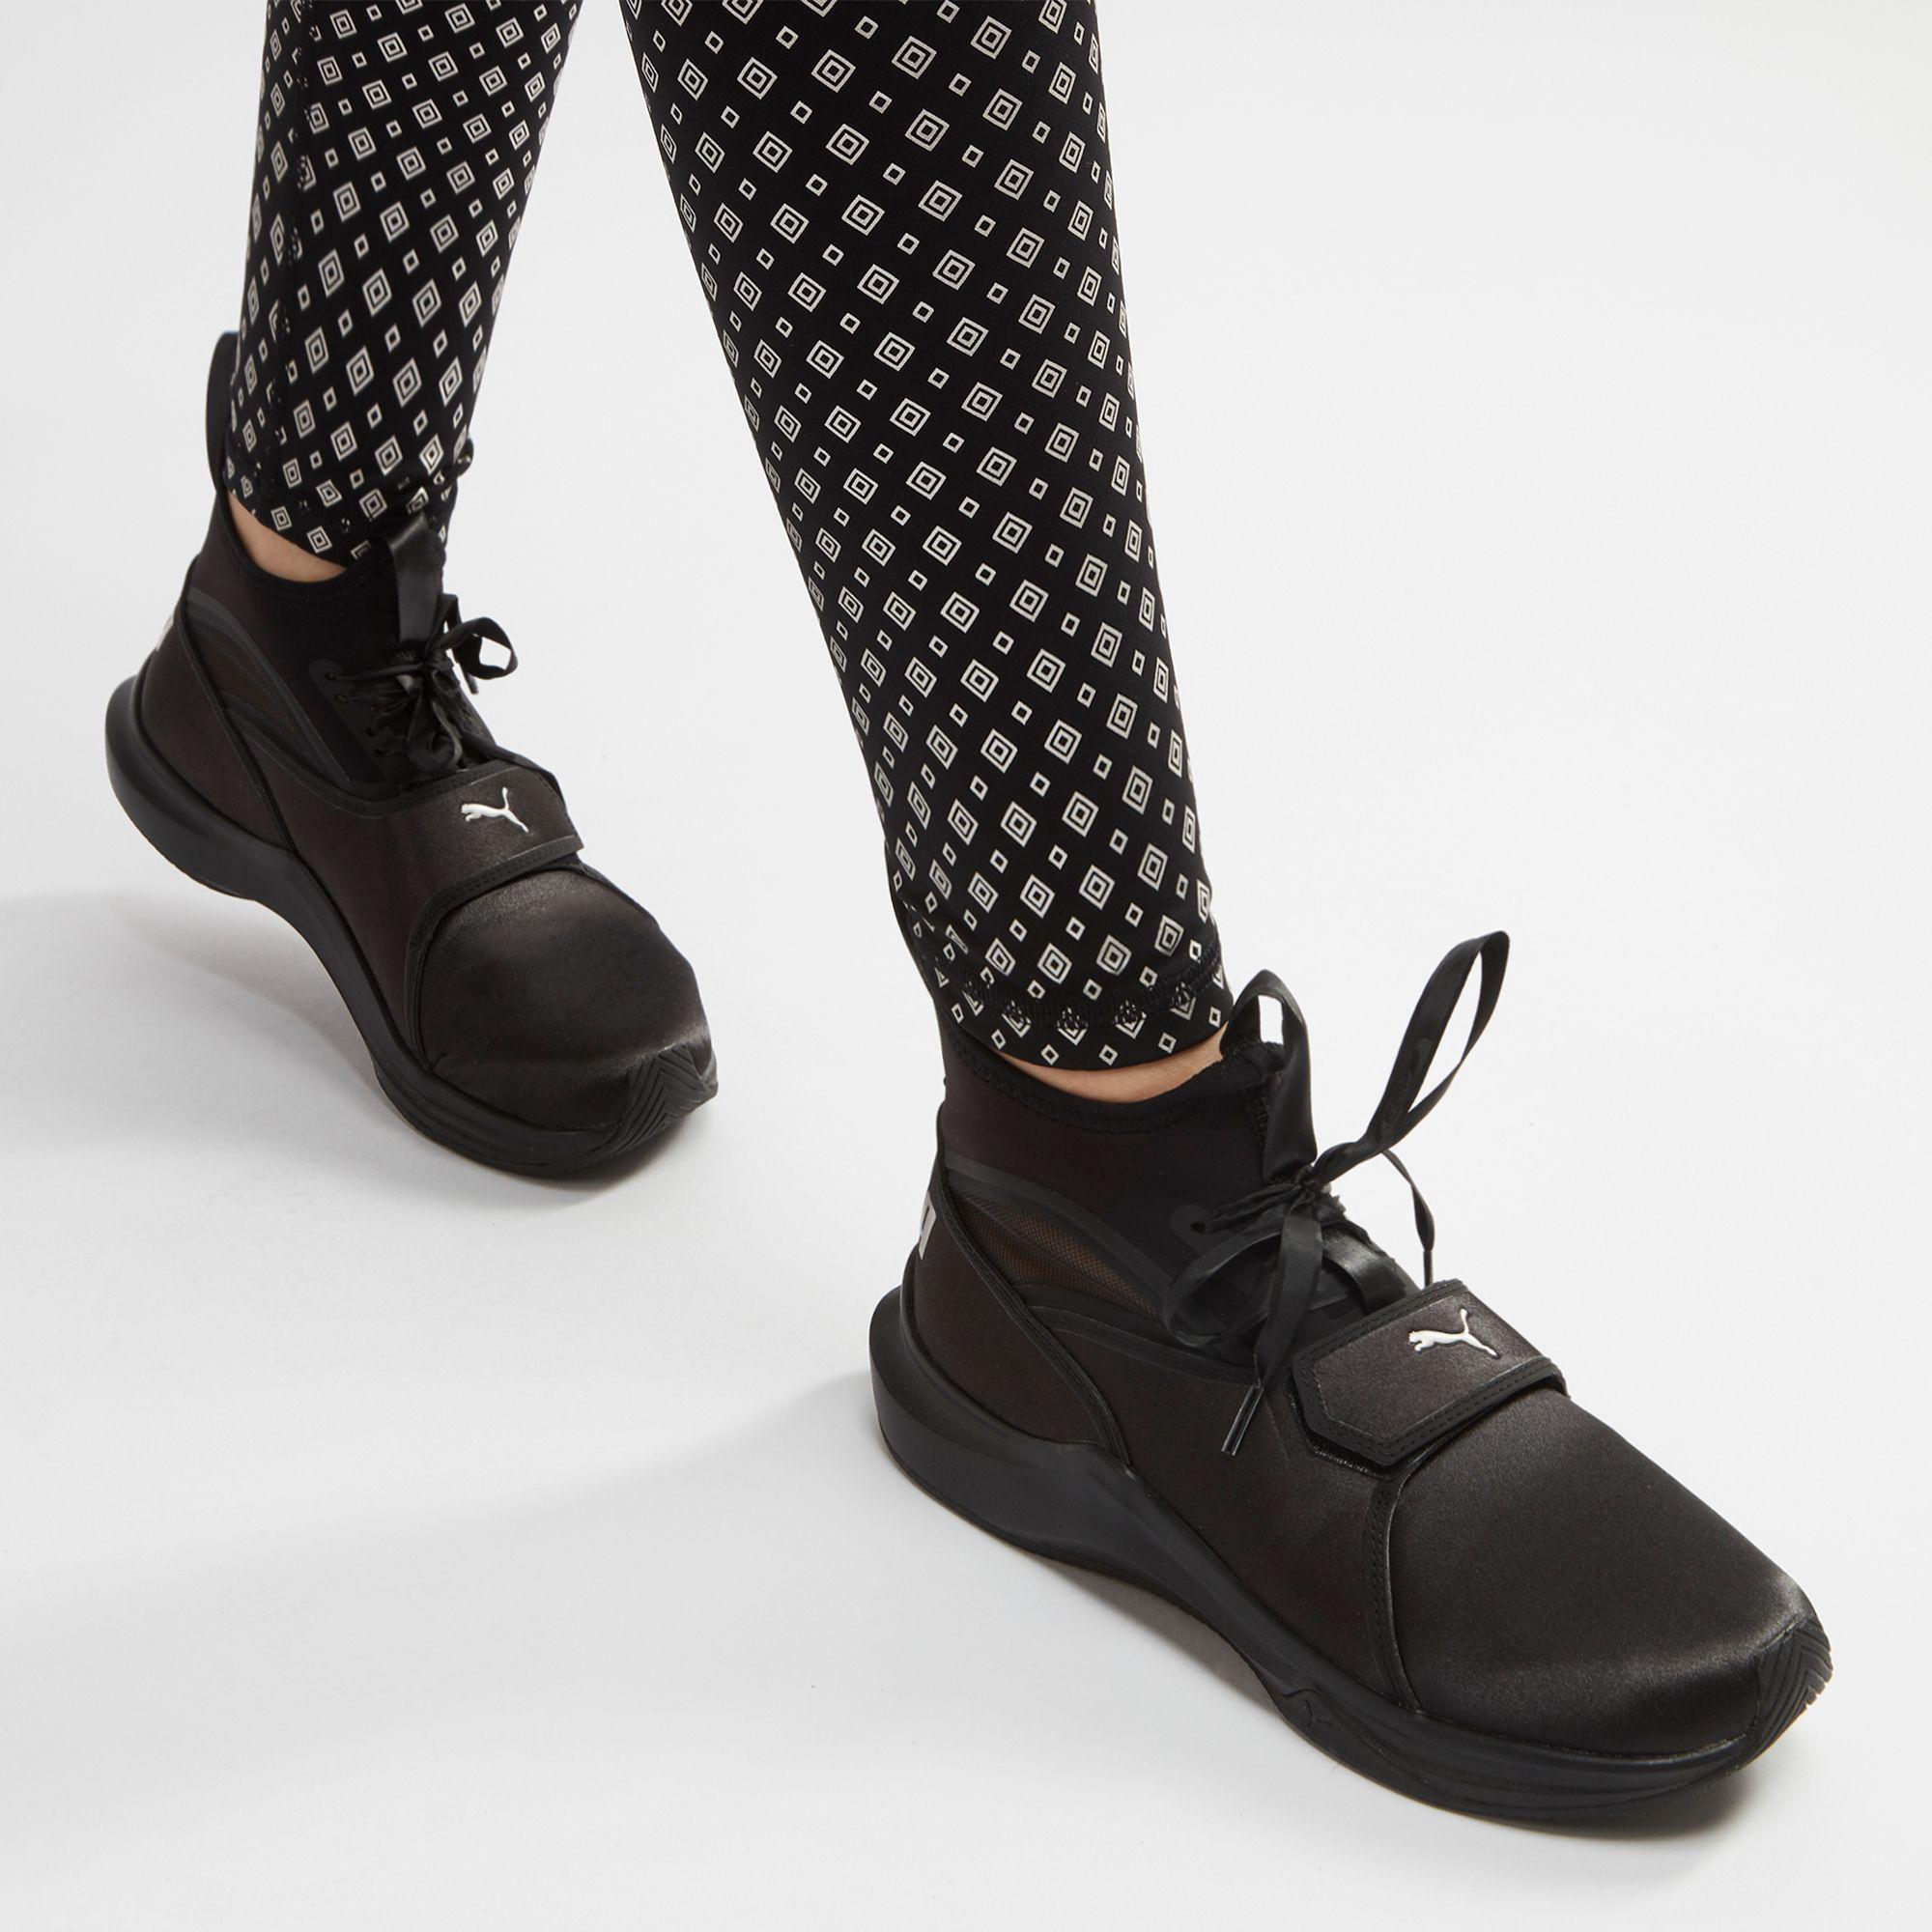 83a311b0d08cbc PUMA En Pointe Phenom Satin Training Shoe